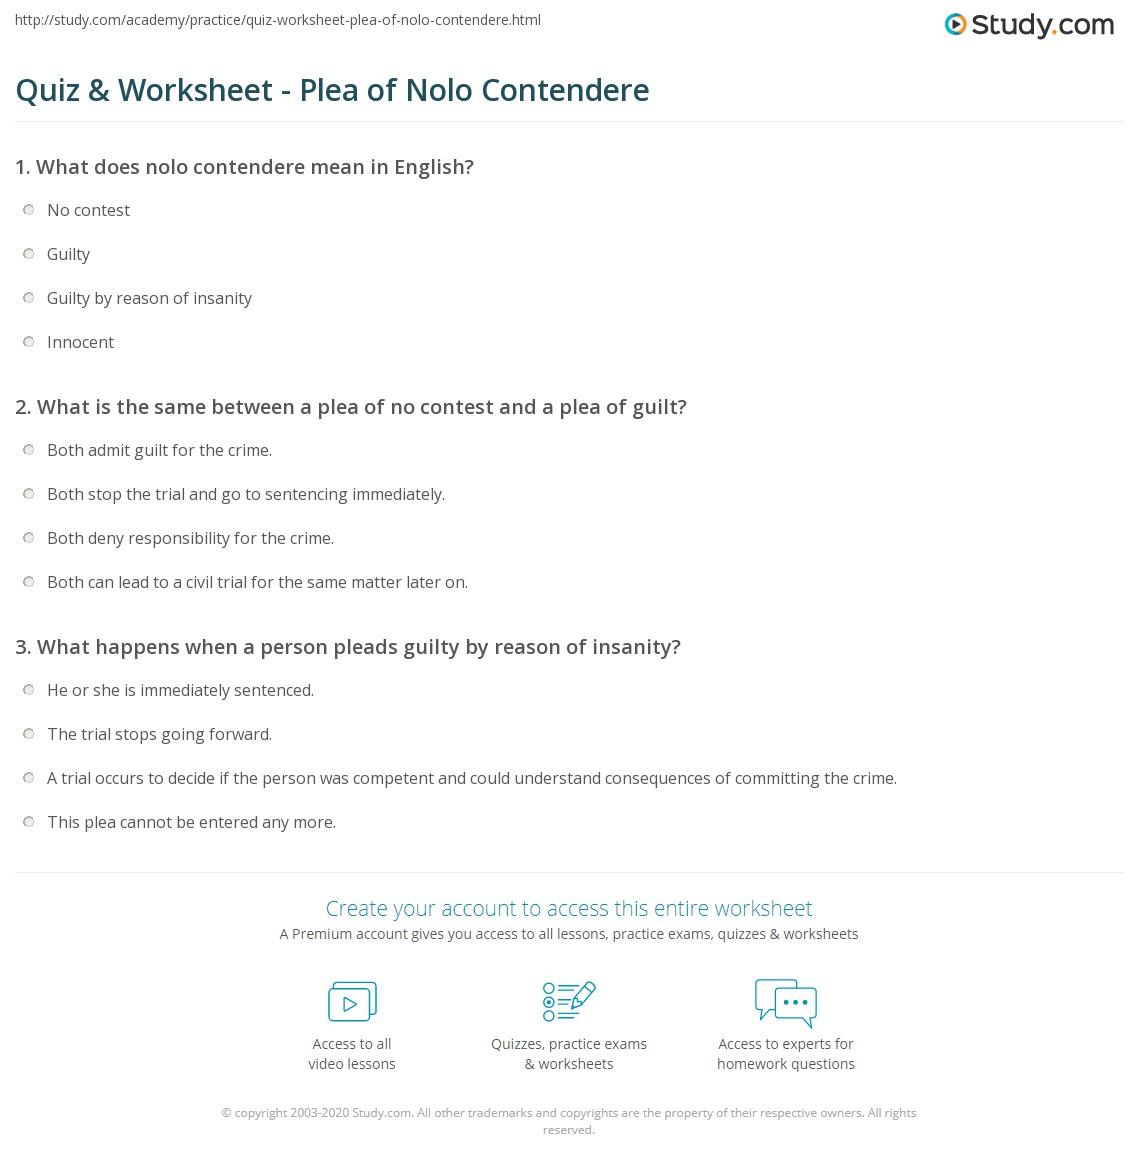 Quiz & Worksheet - Plea of Nolo Contendere | Study com